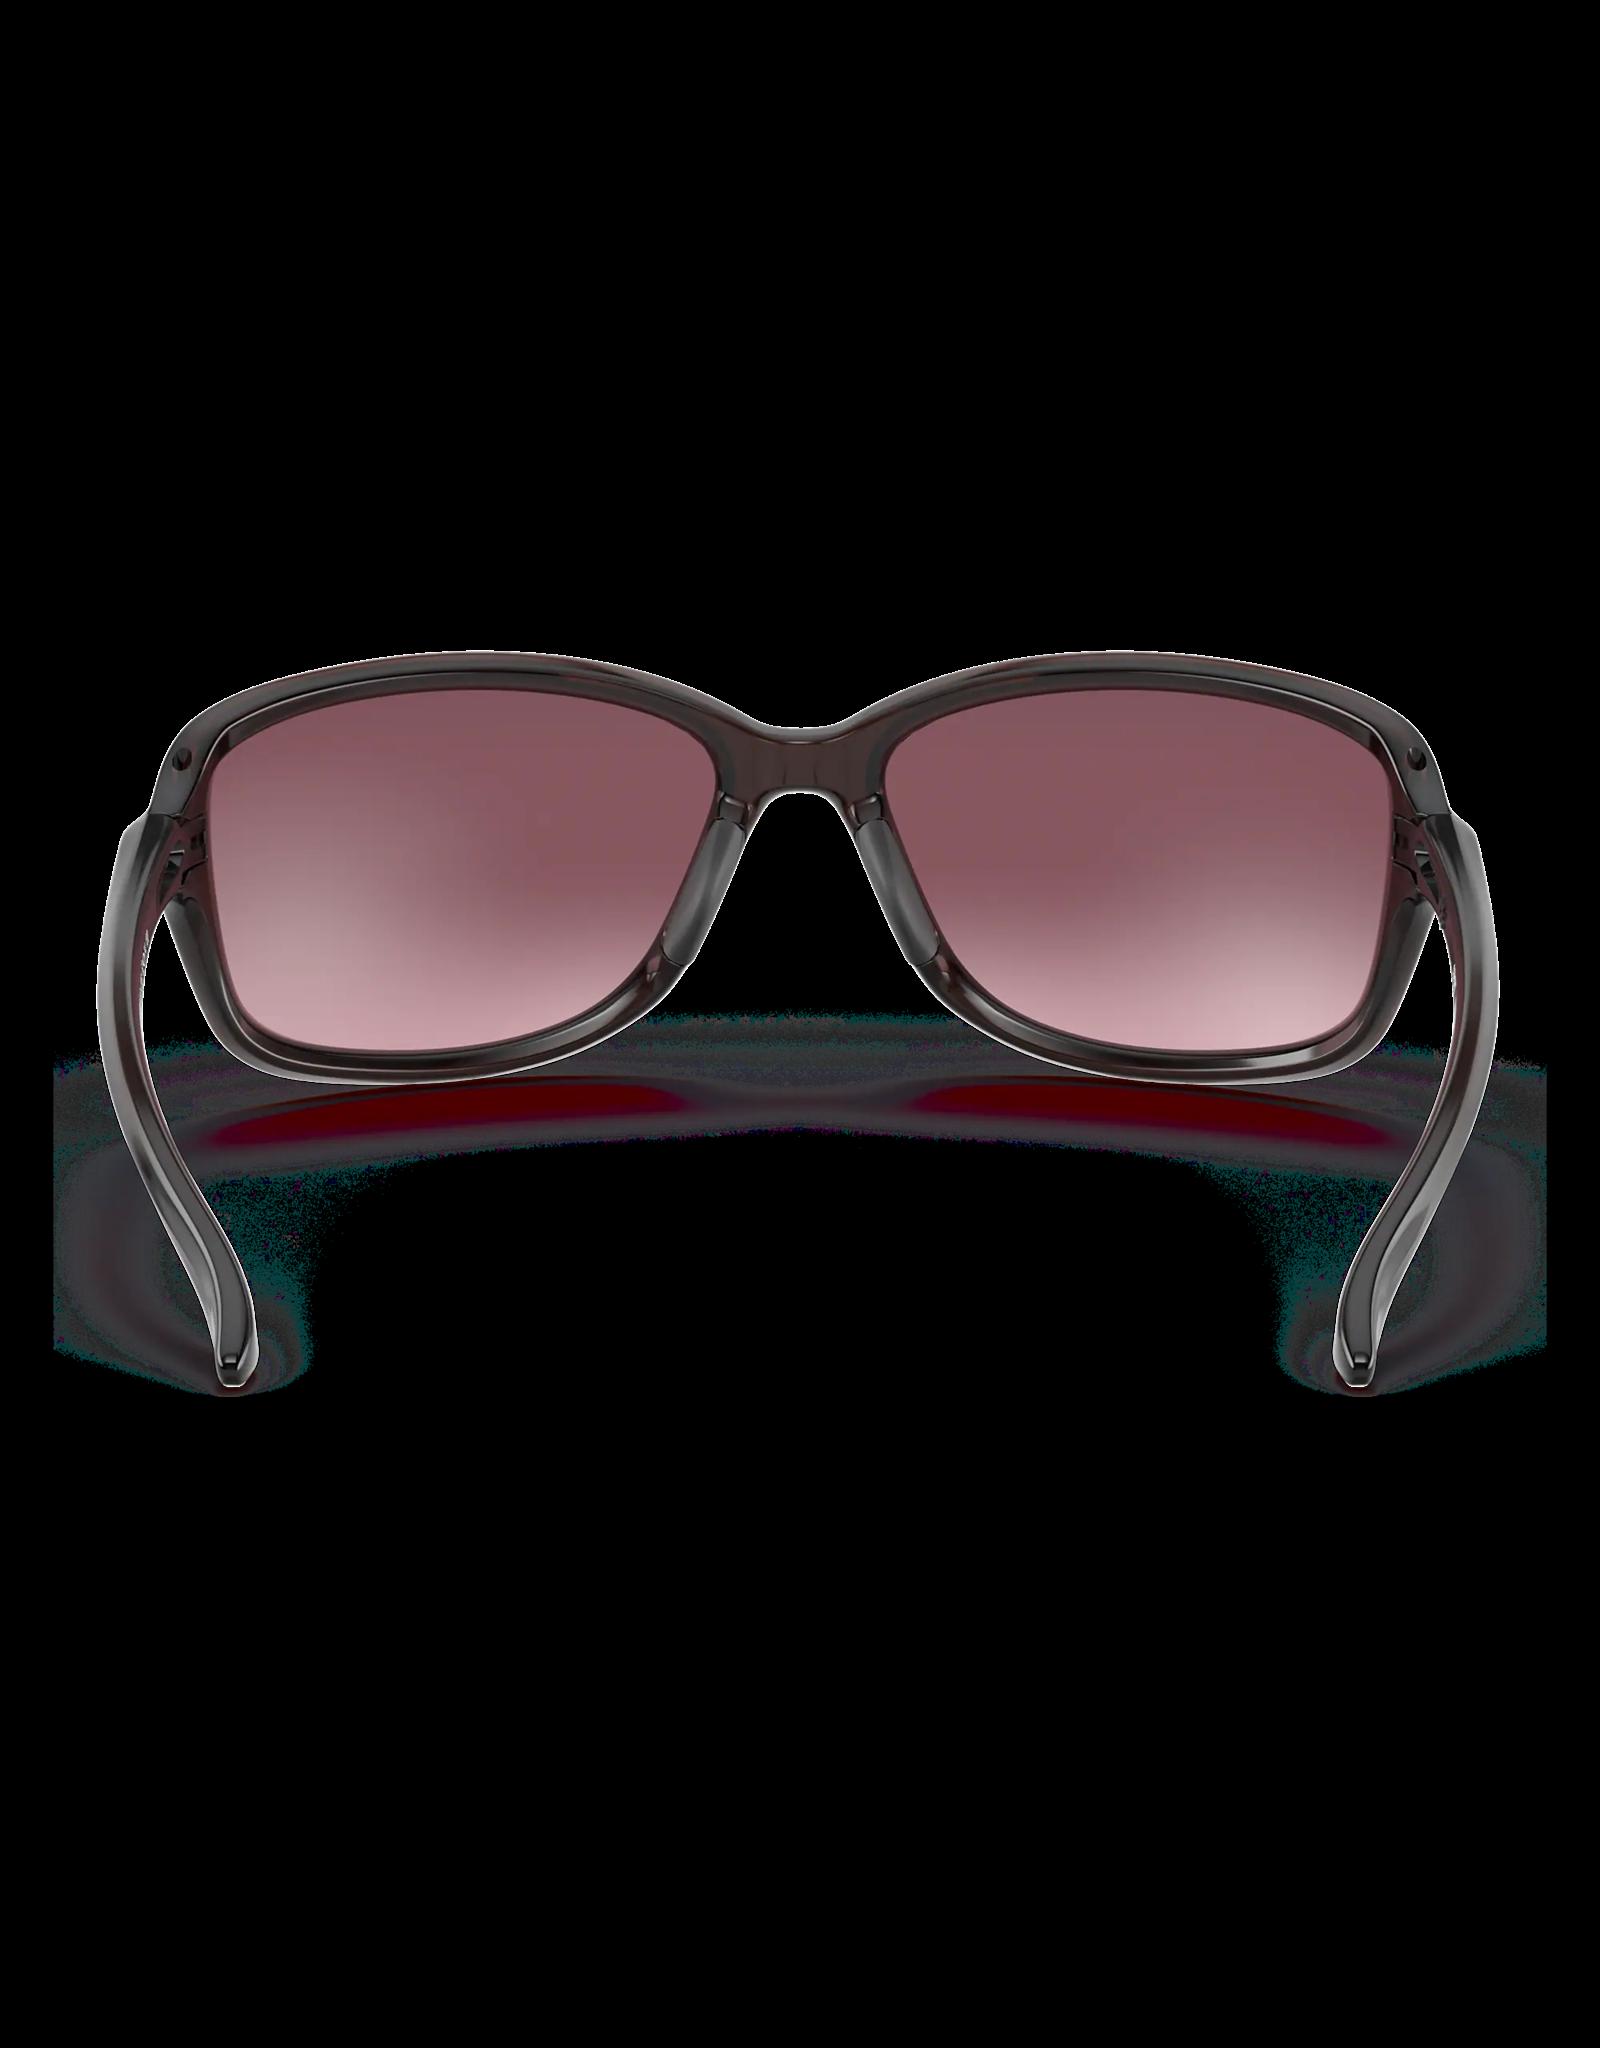 OAKLEY Oakley Cohort amethyst  G40 noir gradient sunglasses